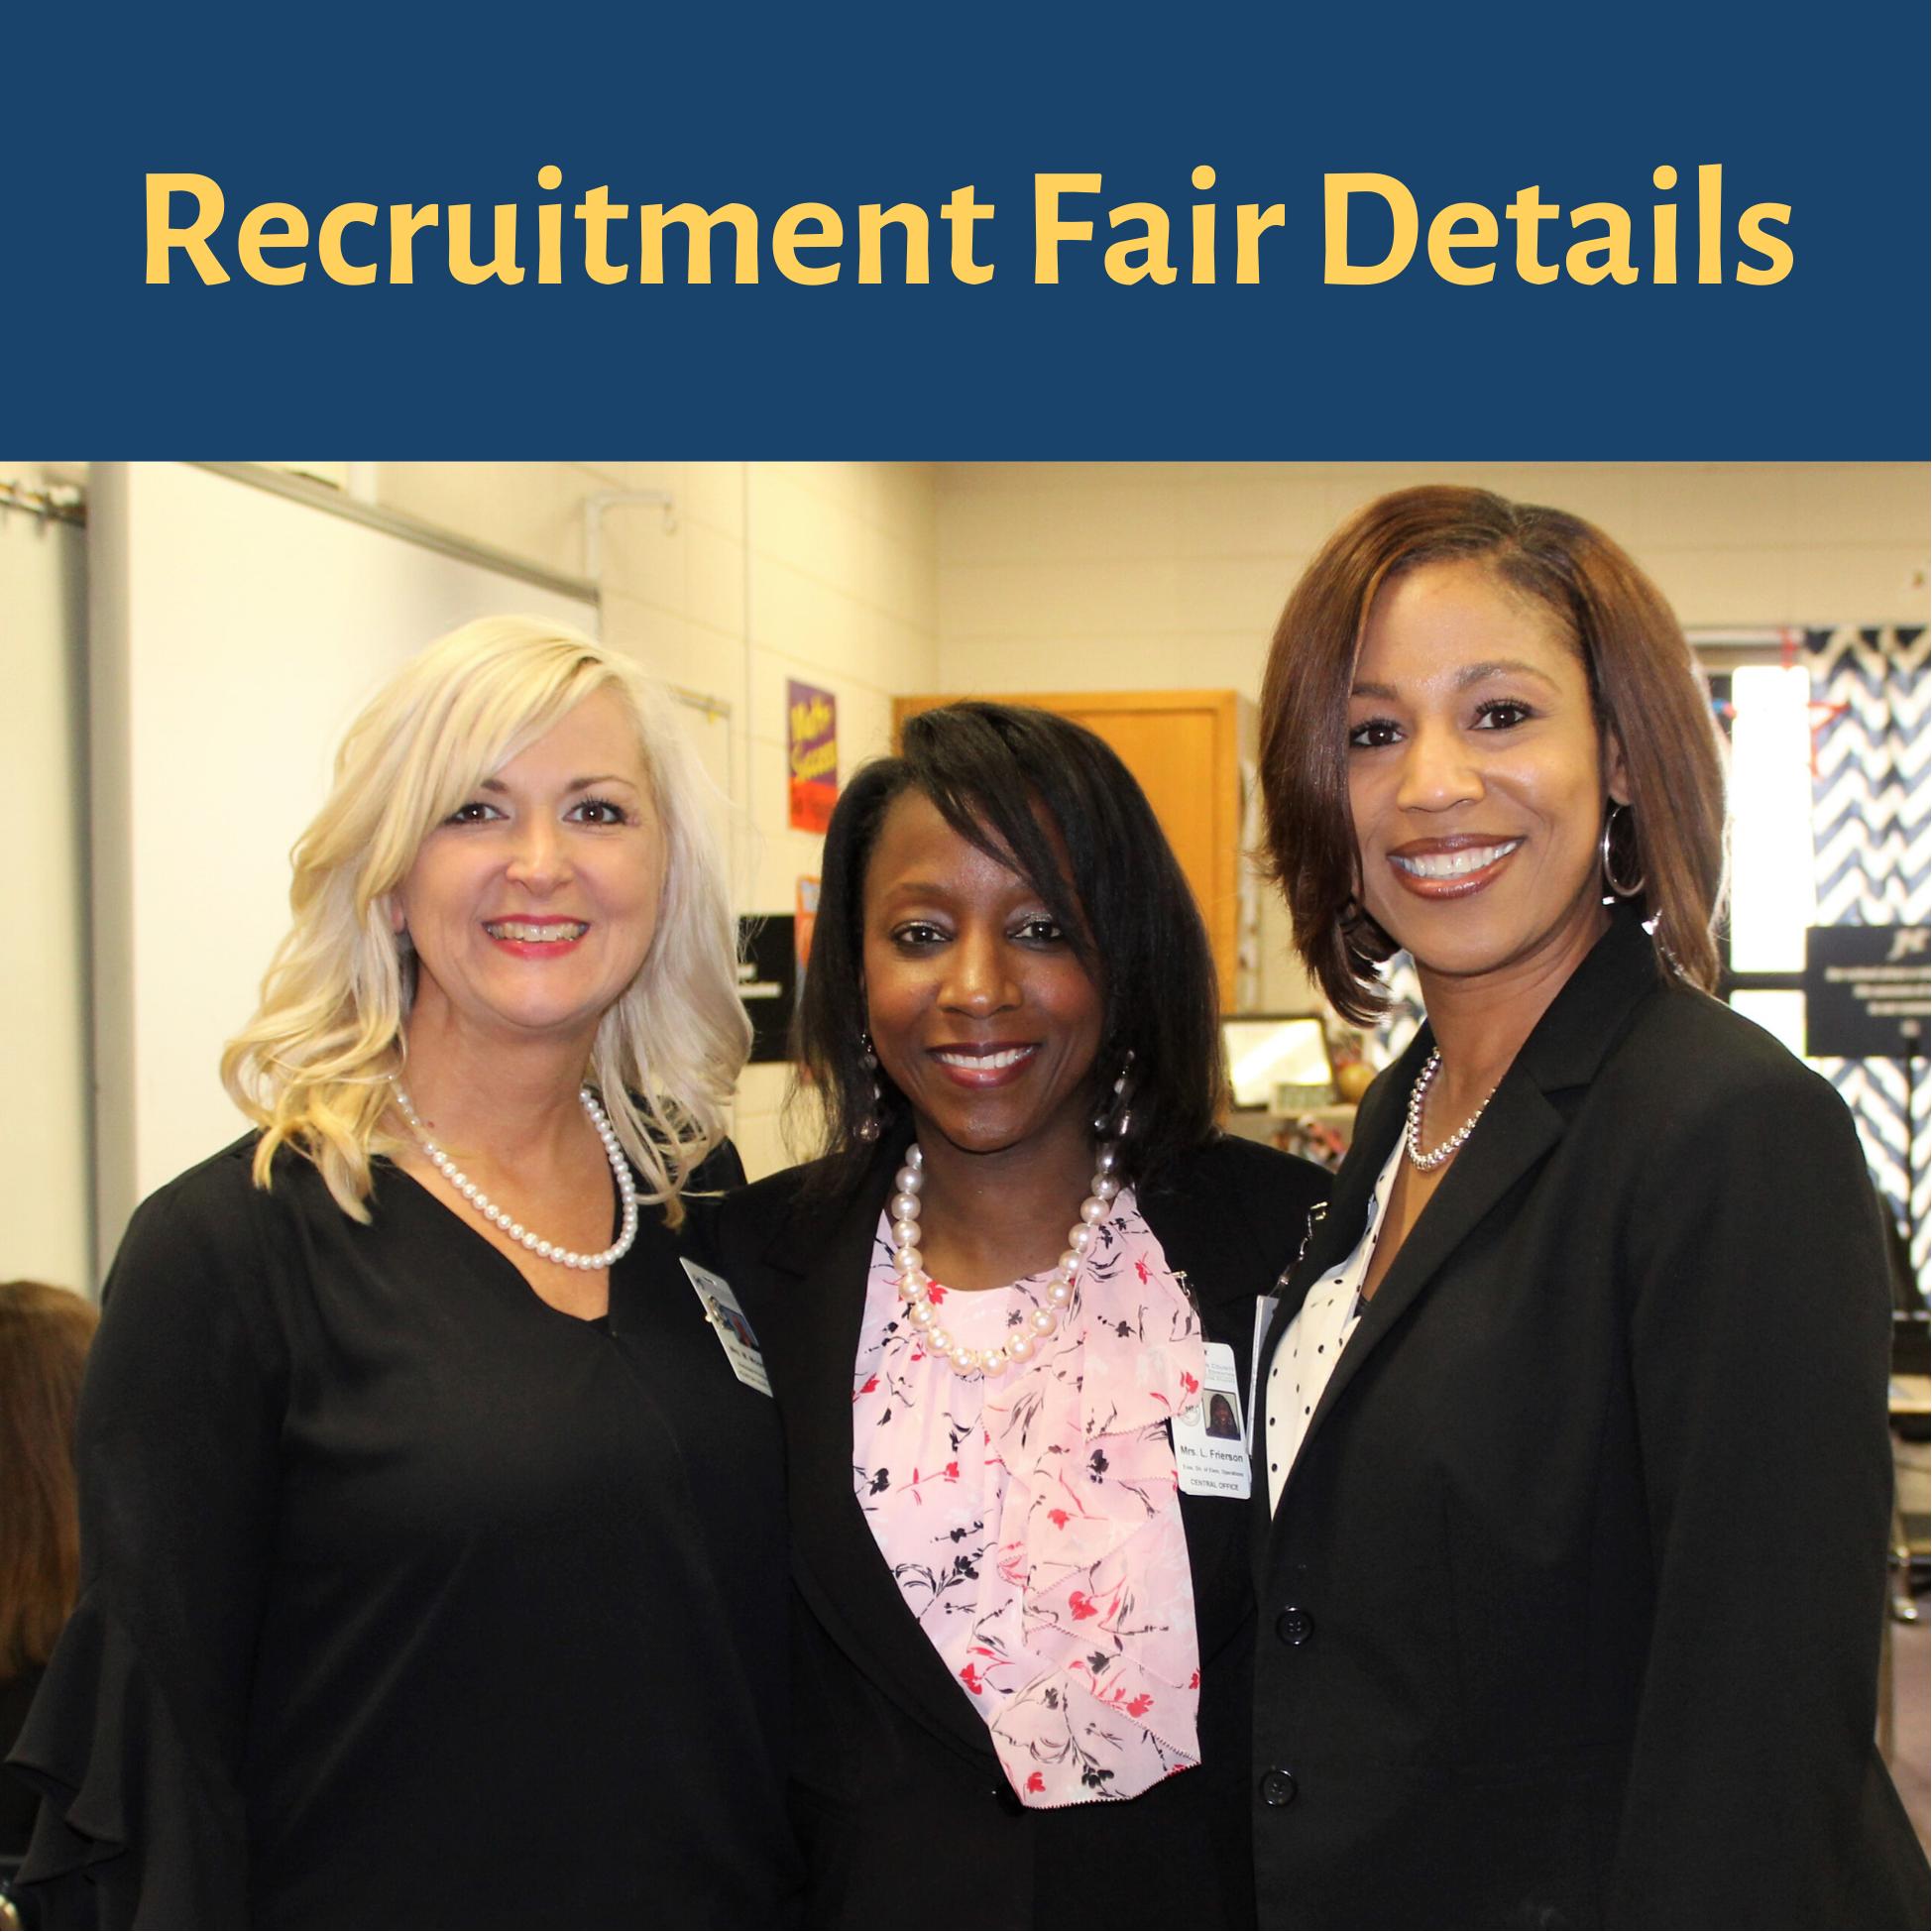 Recruitment Fair Details